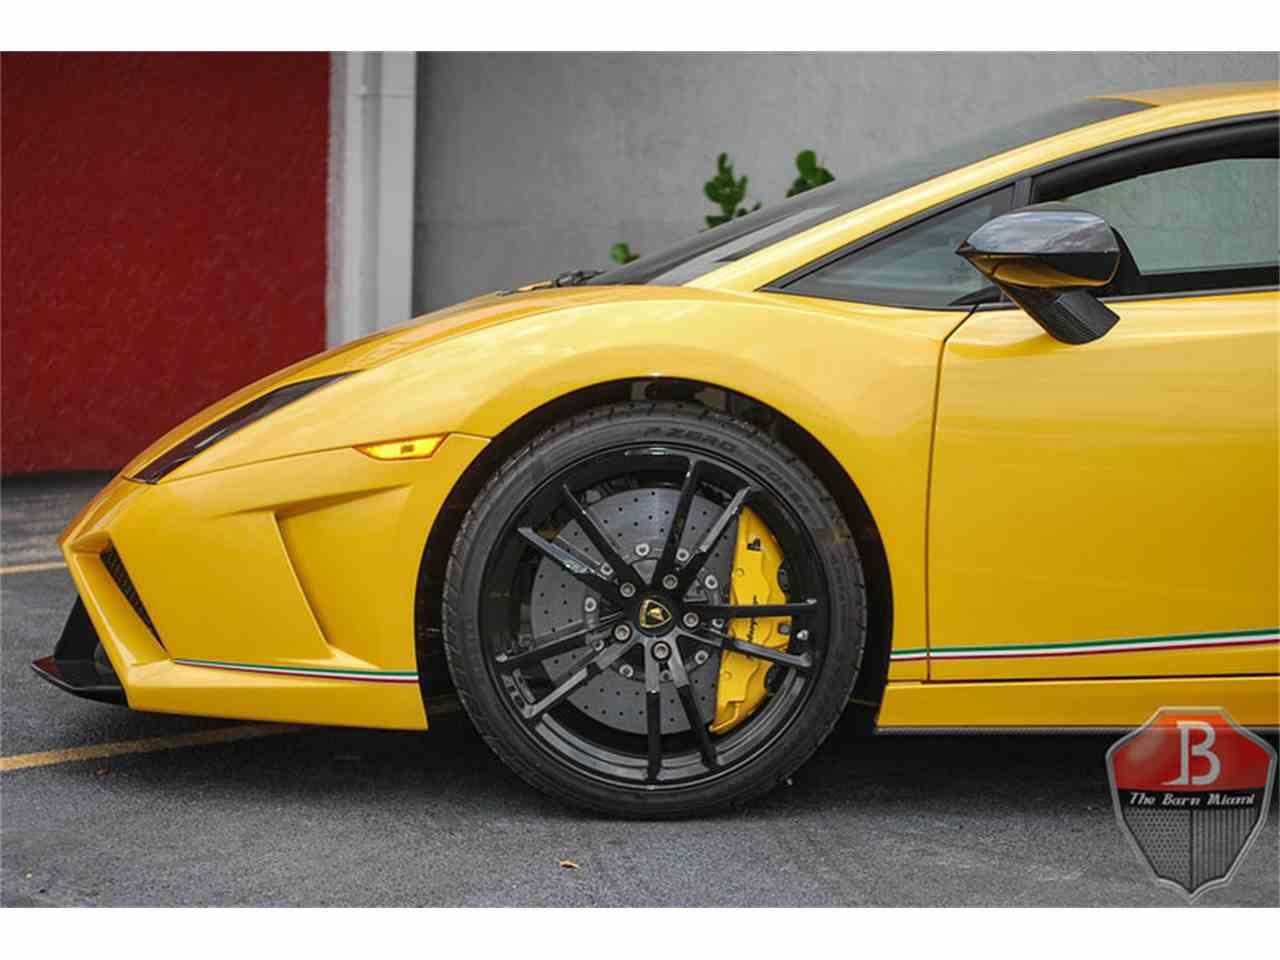 Large Picture of '14 Gallardo Squadra Corse located in Miami Florida - $244,900.00 Offered by The Barn Miami - IRP5